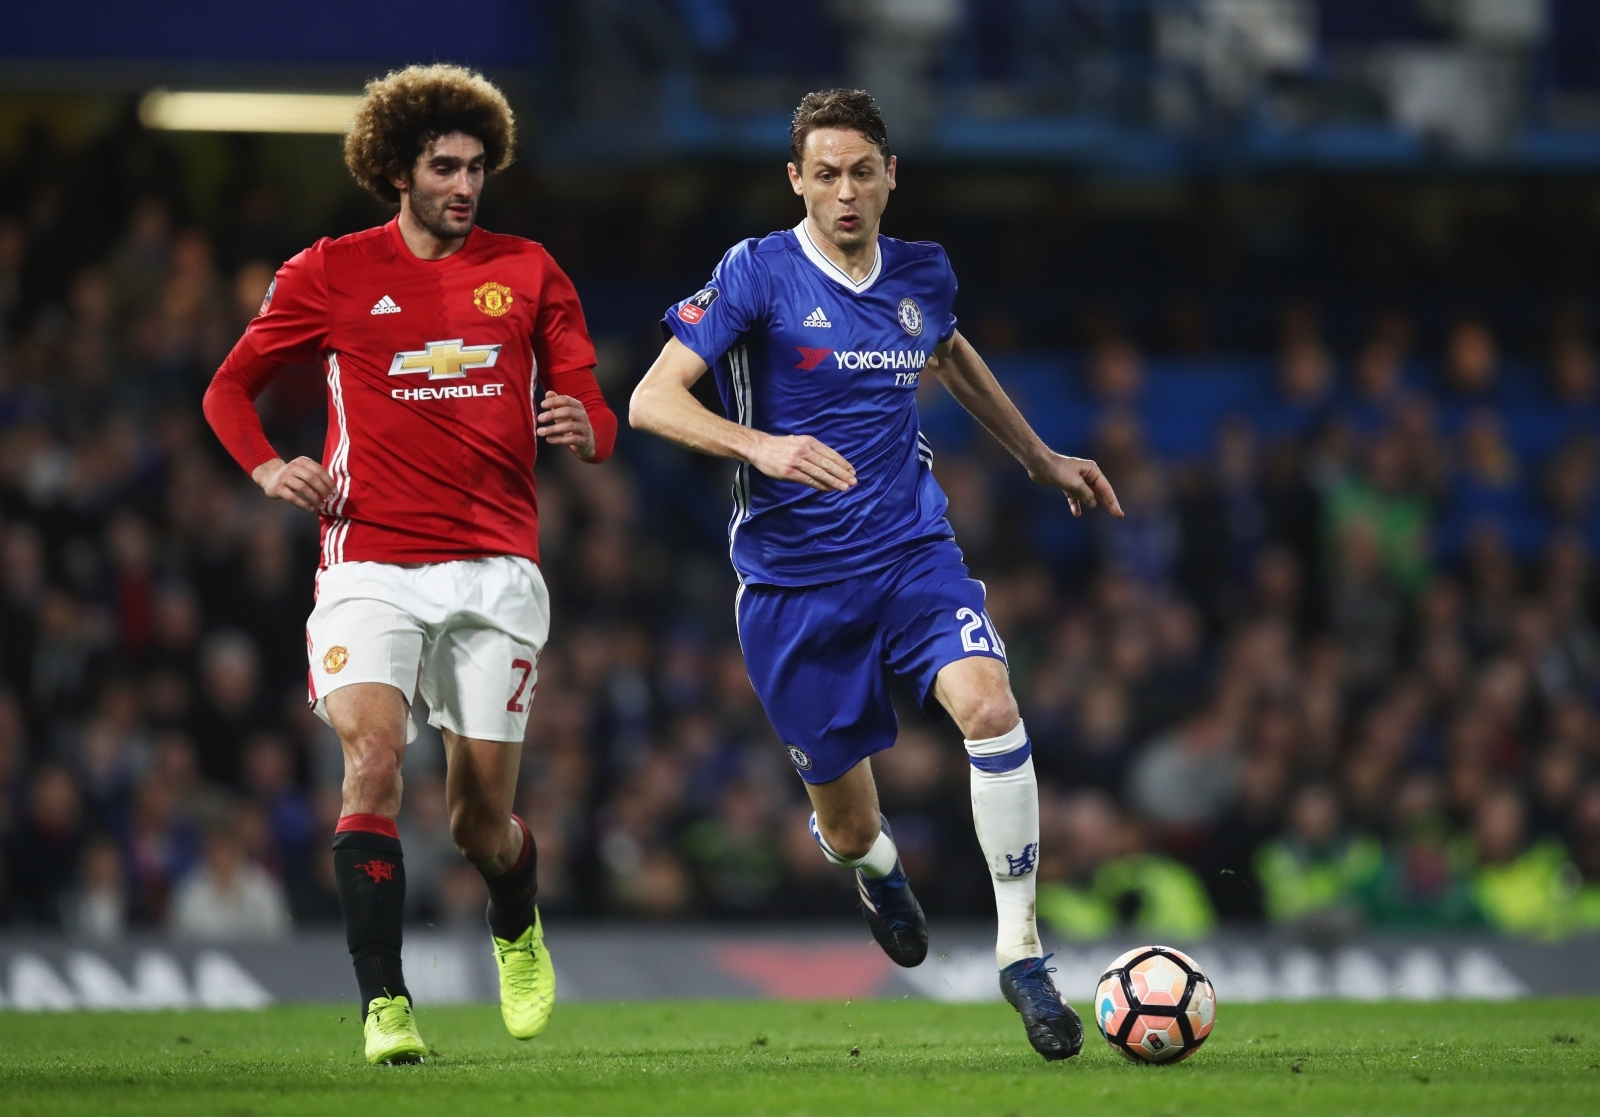 It s a risk Chelsea s decision to let Nemanja Matic join